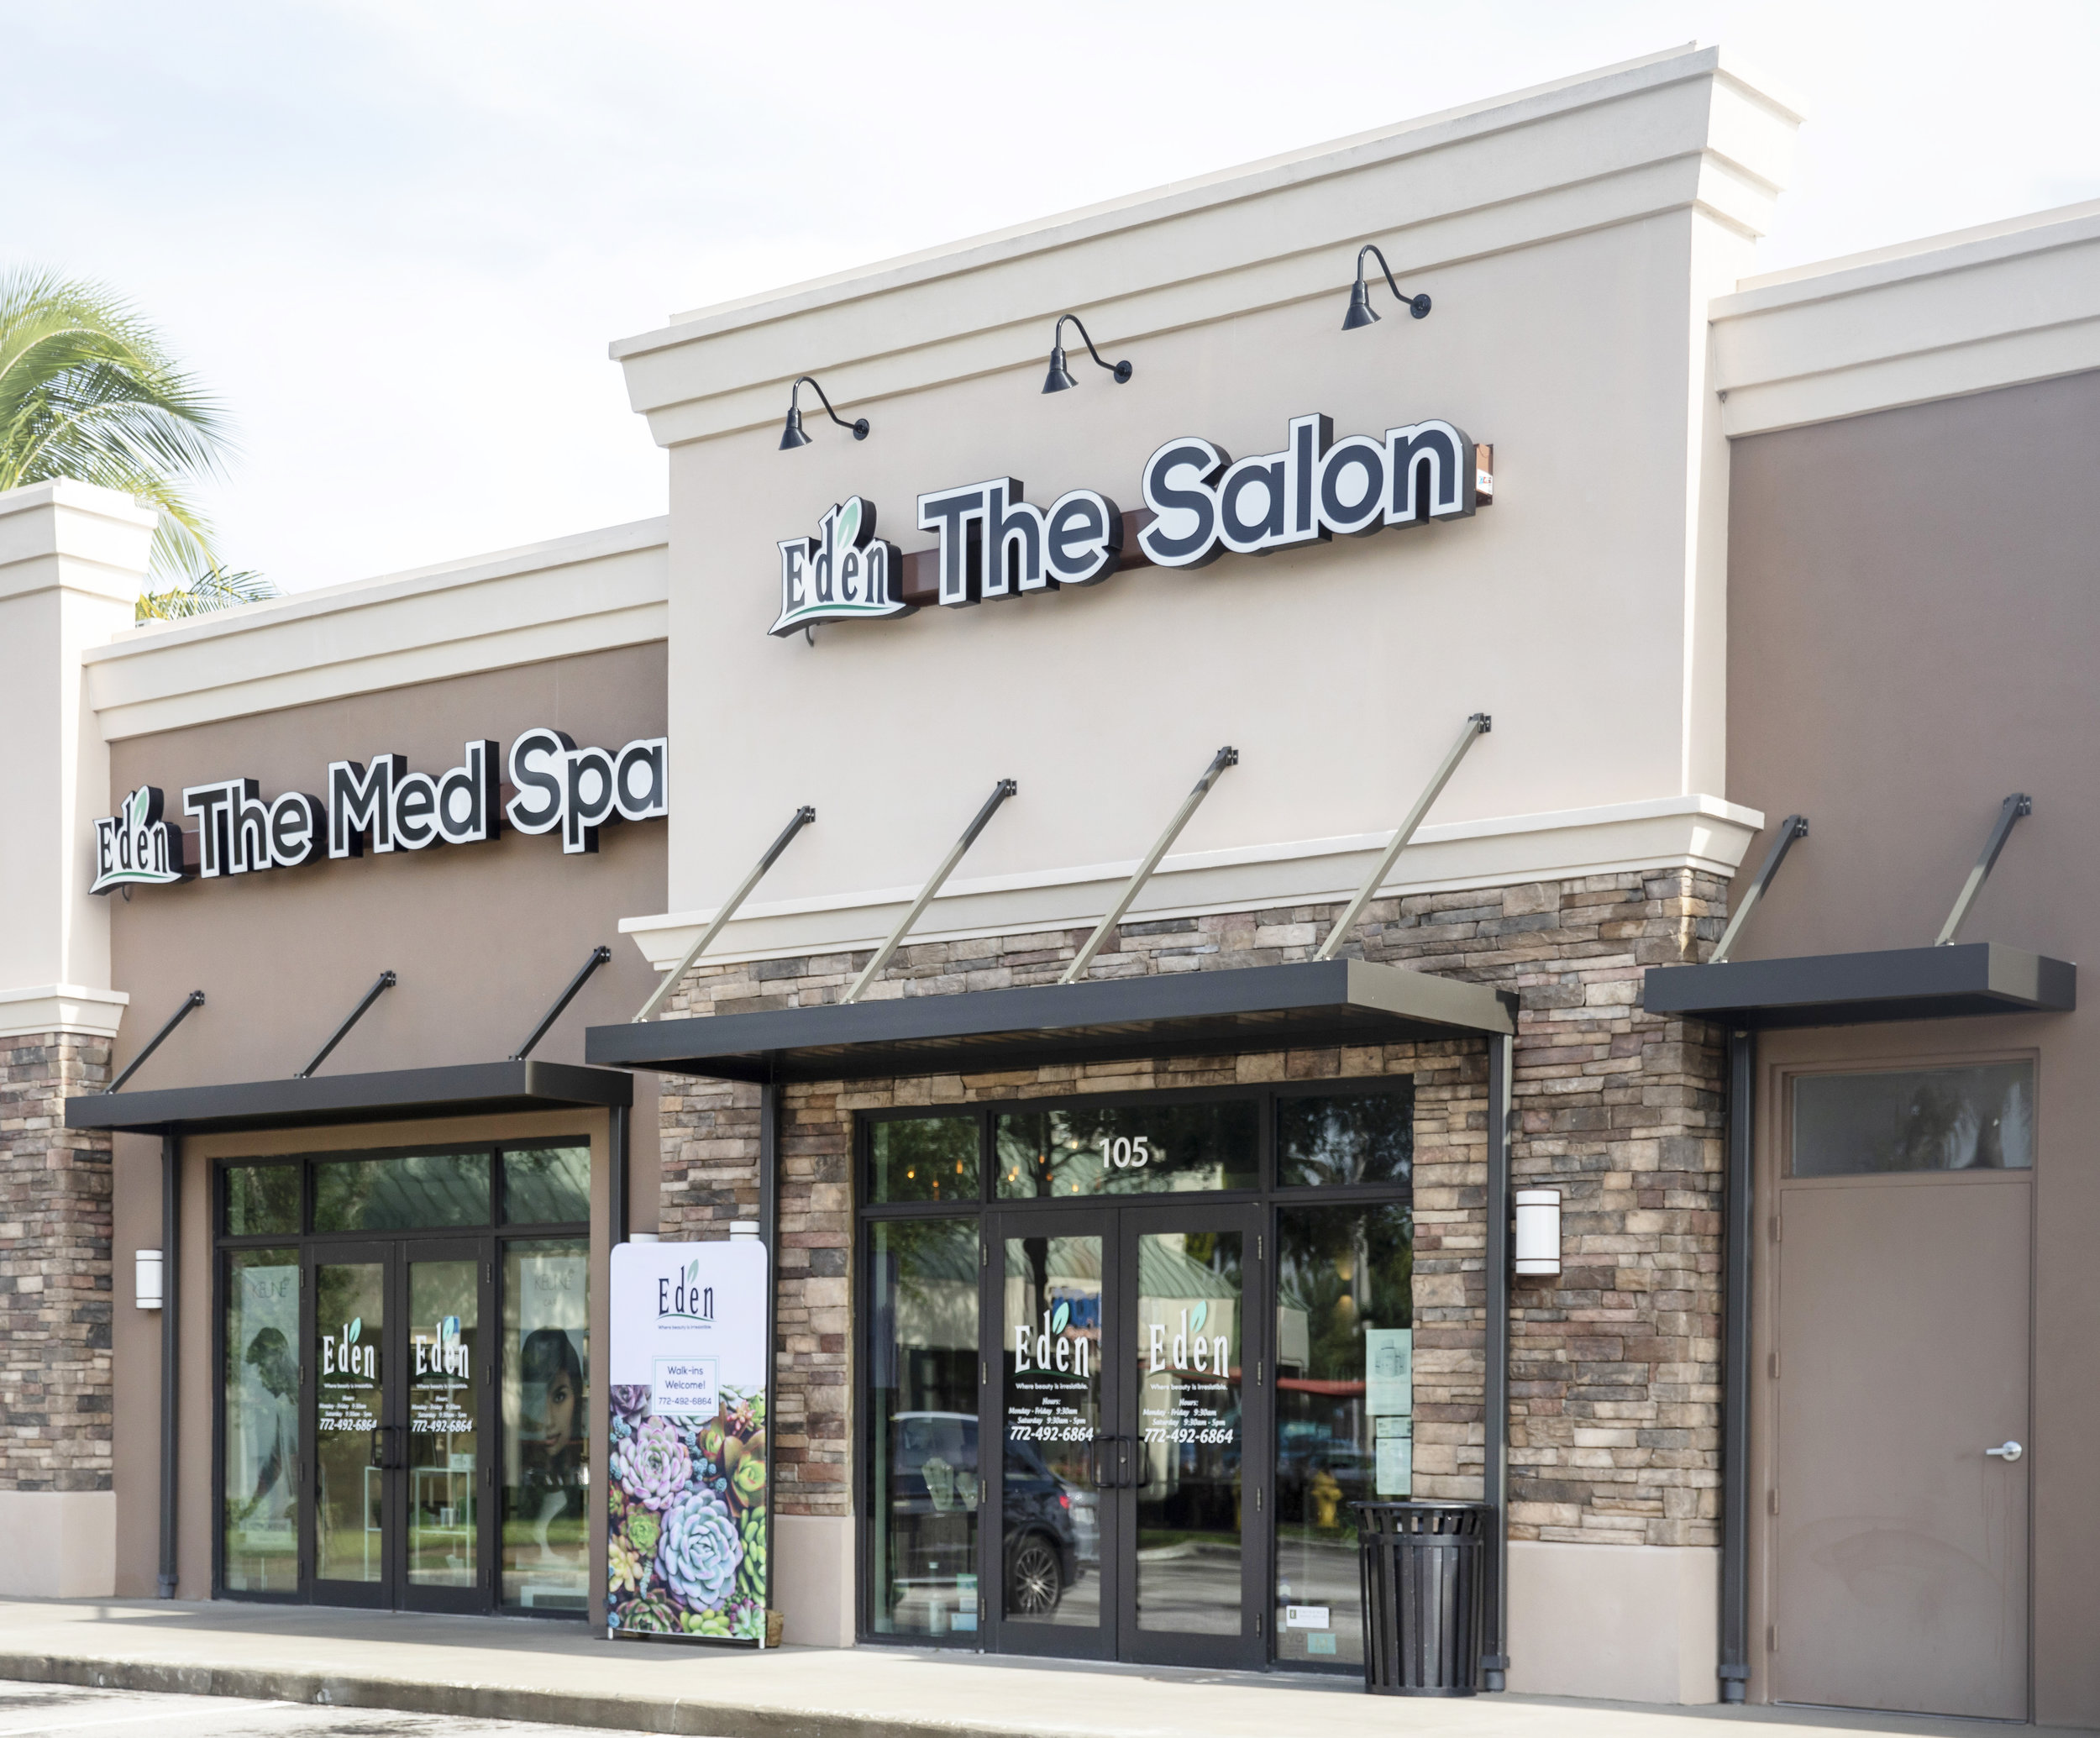 Vero Beach Hair Salon Photo Tour - Eden Salon & Med Spa